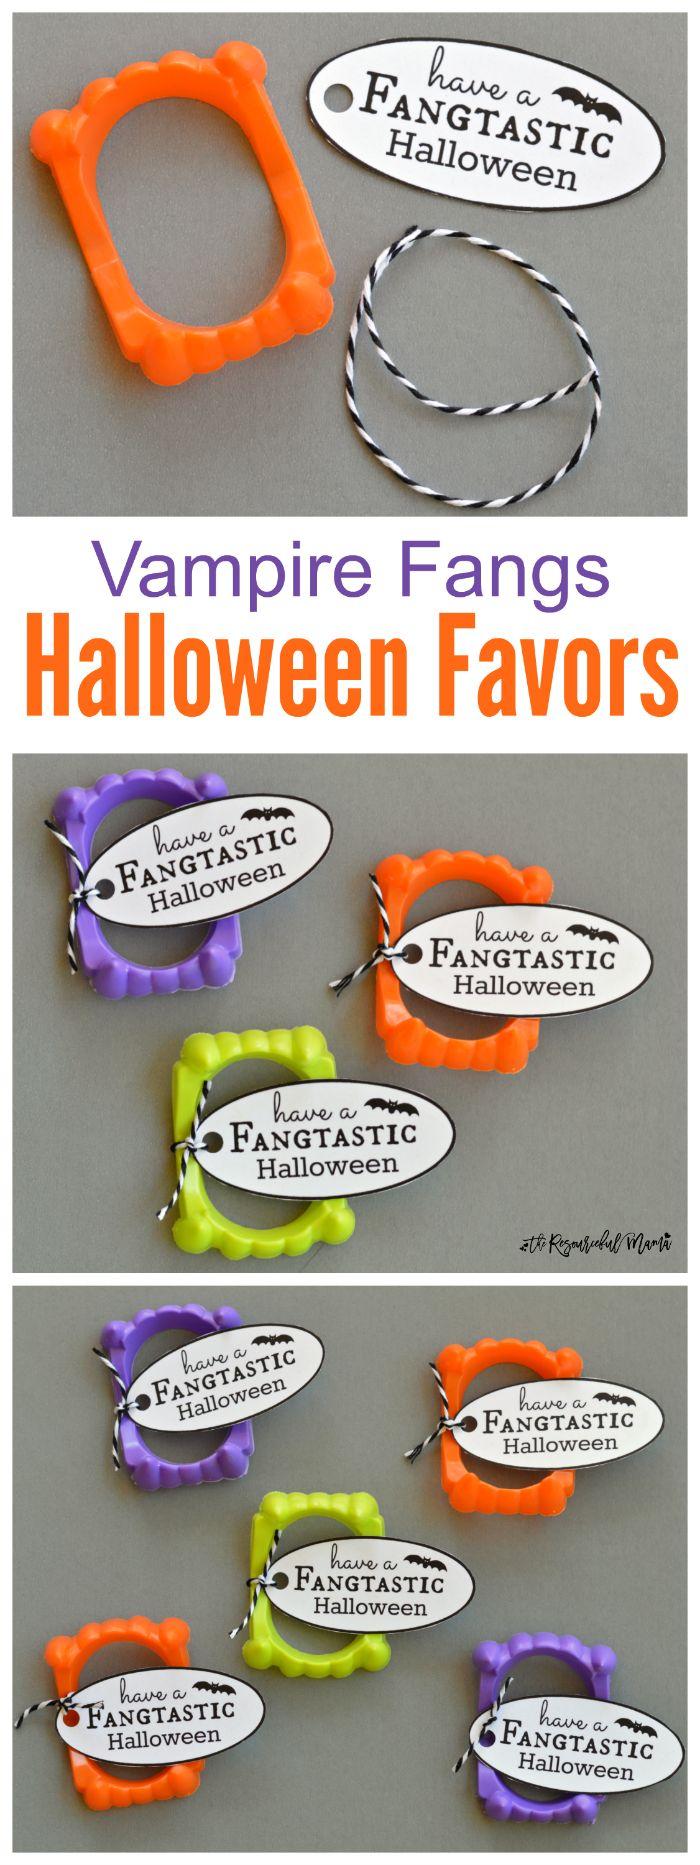 Best 25+ Halloween favors ideas on Pinterest   Halloween party ...